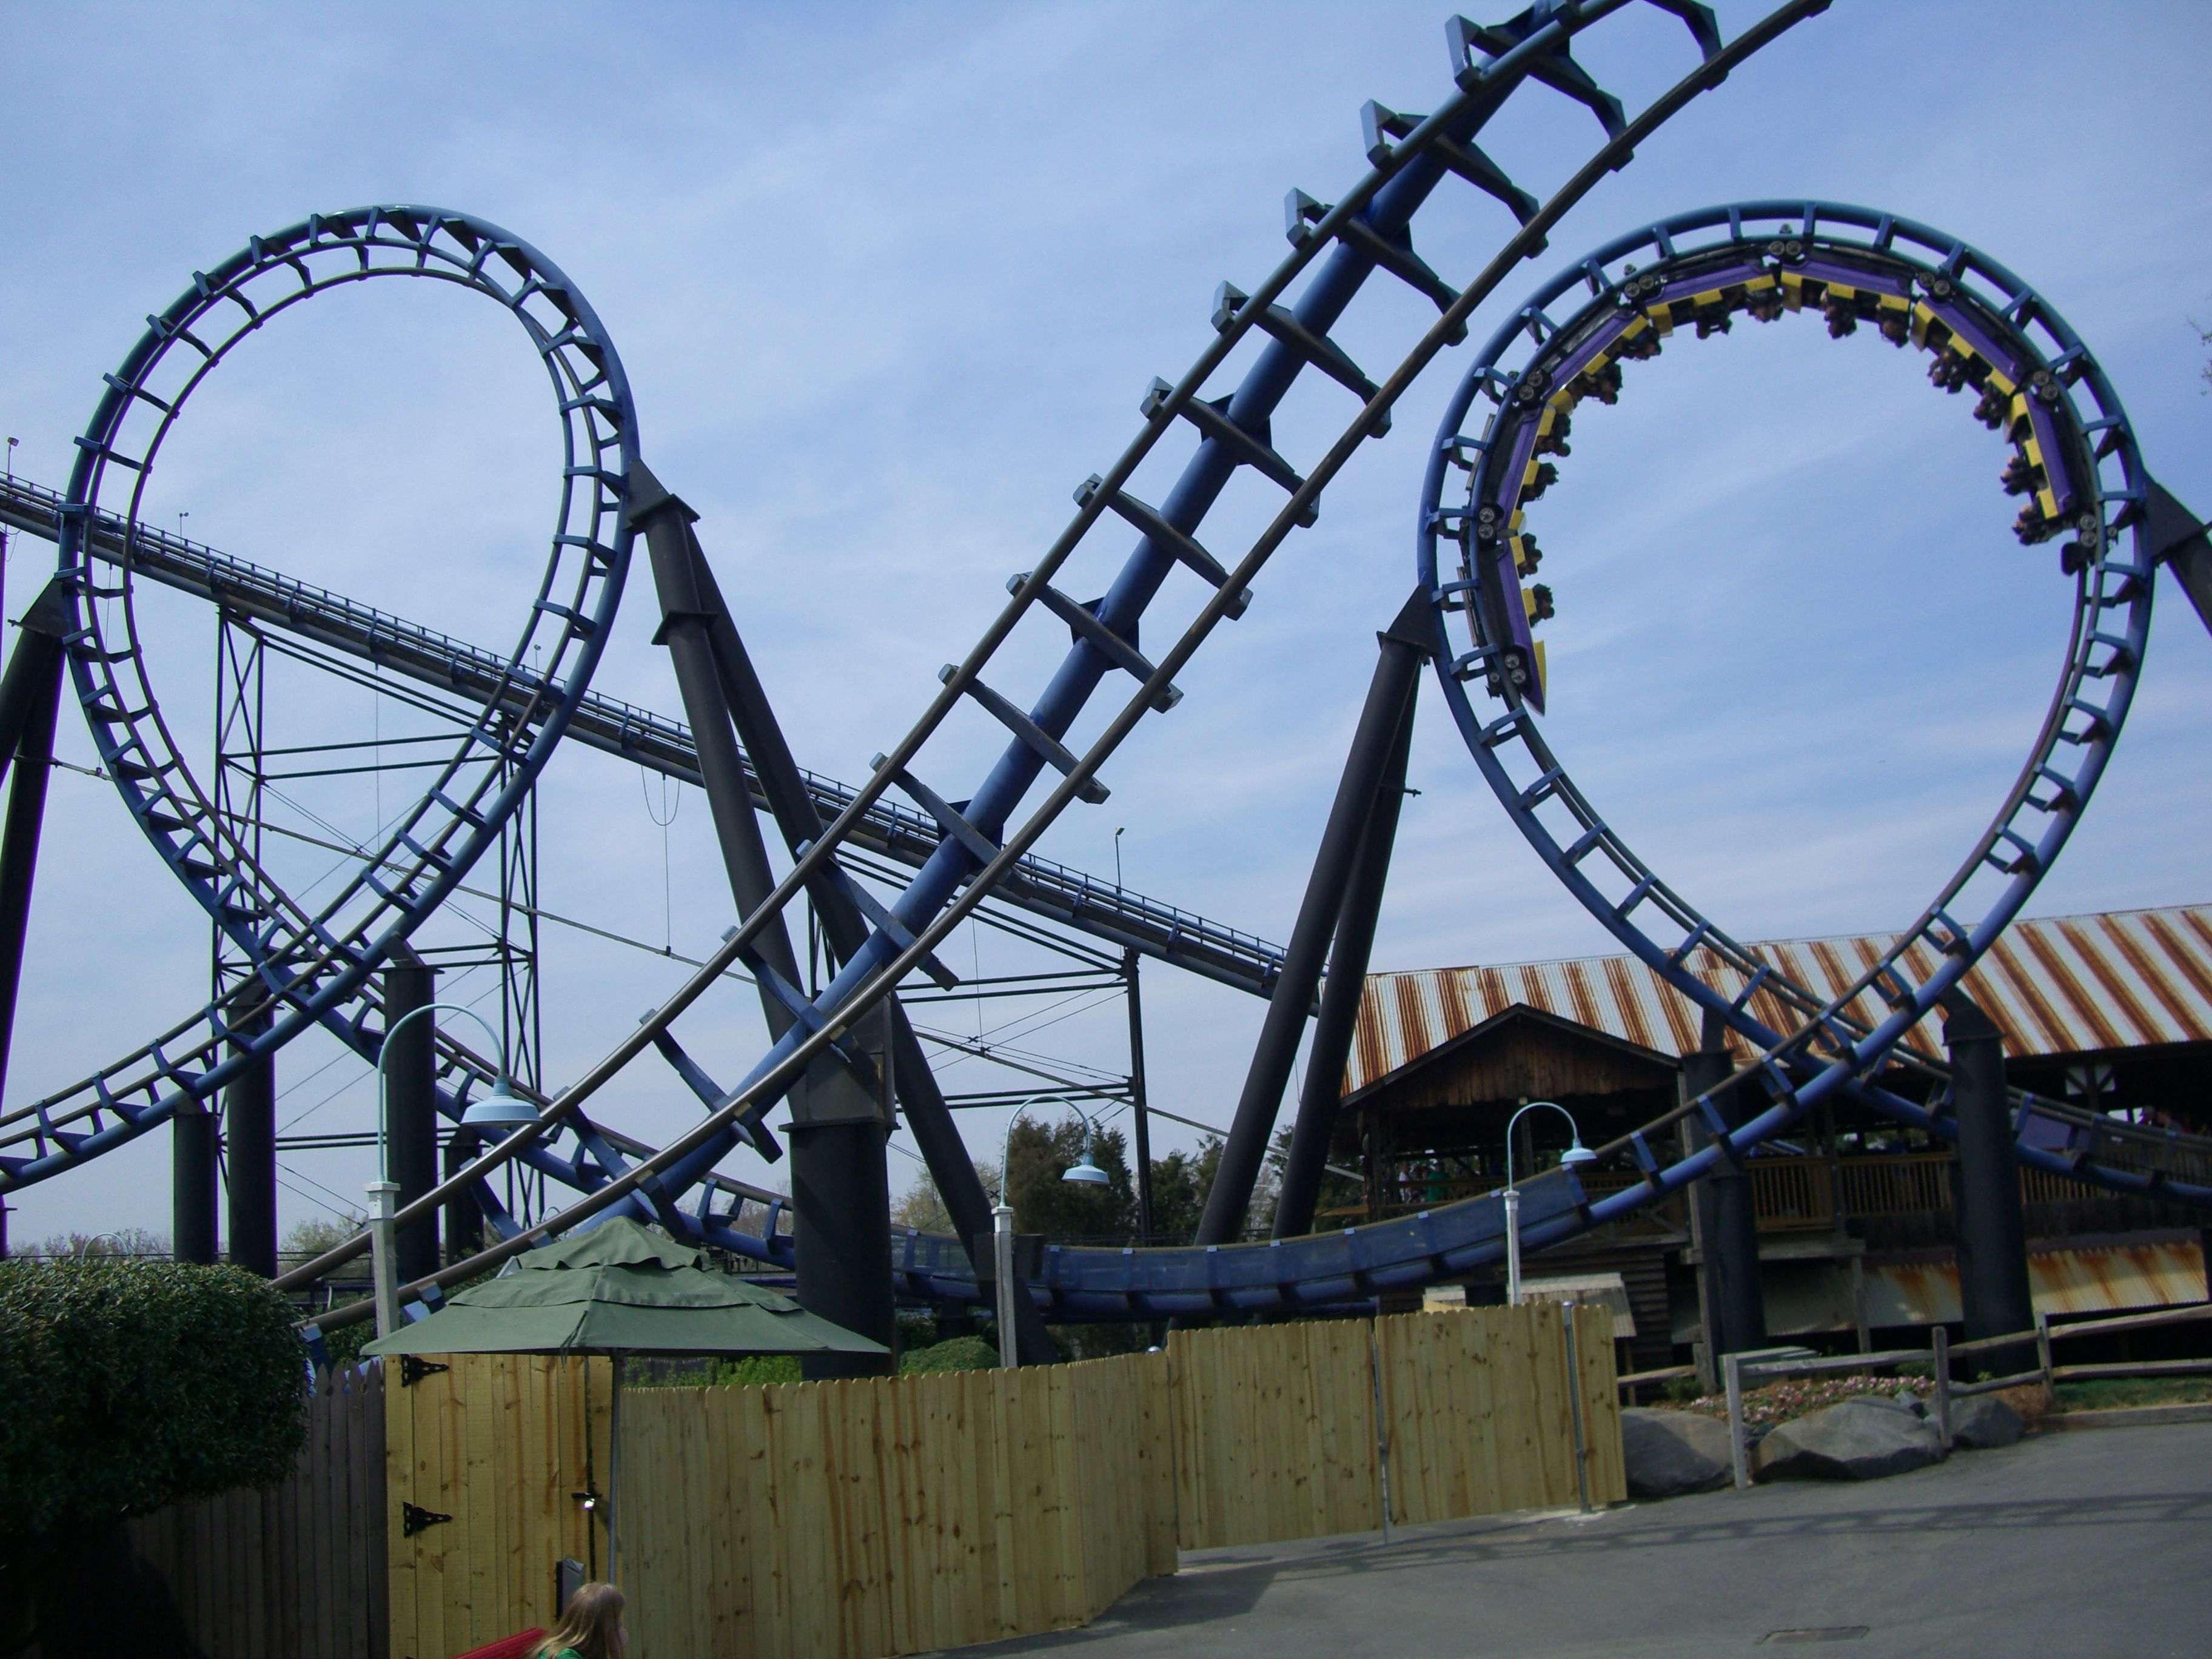 Carolina Cyclone, Carowinds | Let's Go! | Best amusement parks